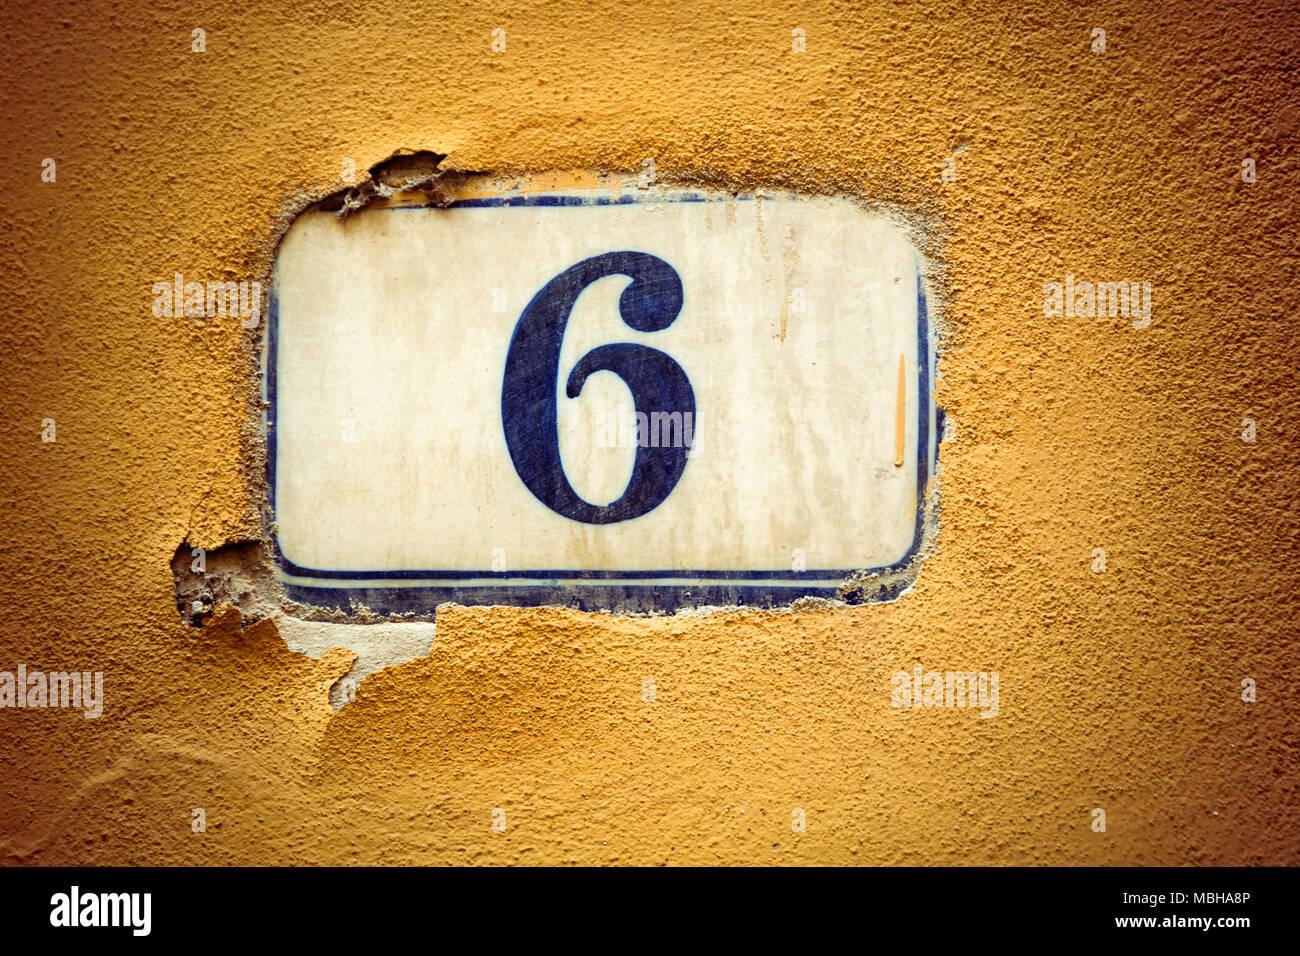 Number six enamel door number on plaster wall - Stock Image